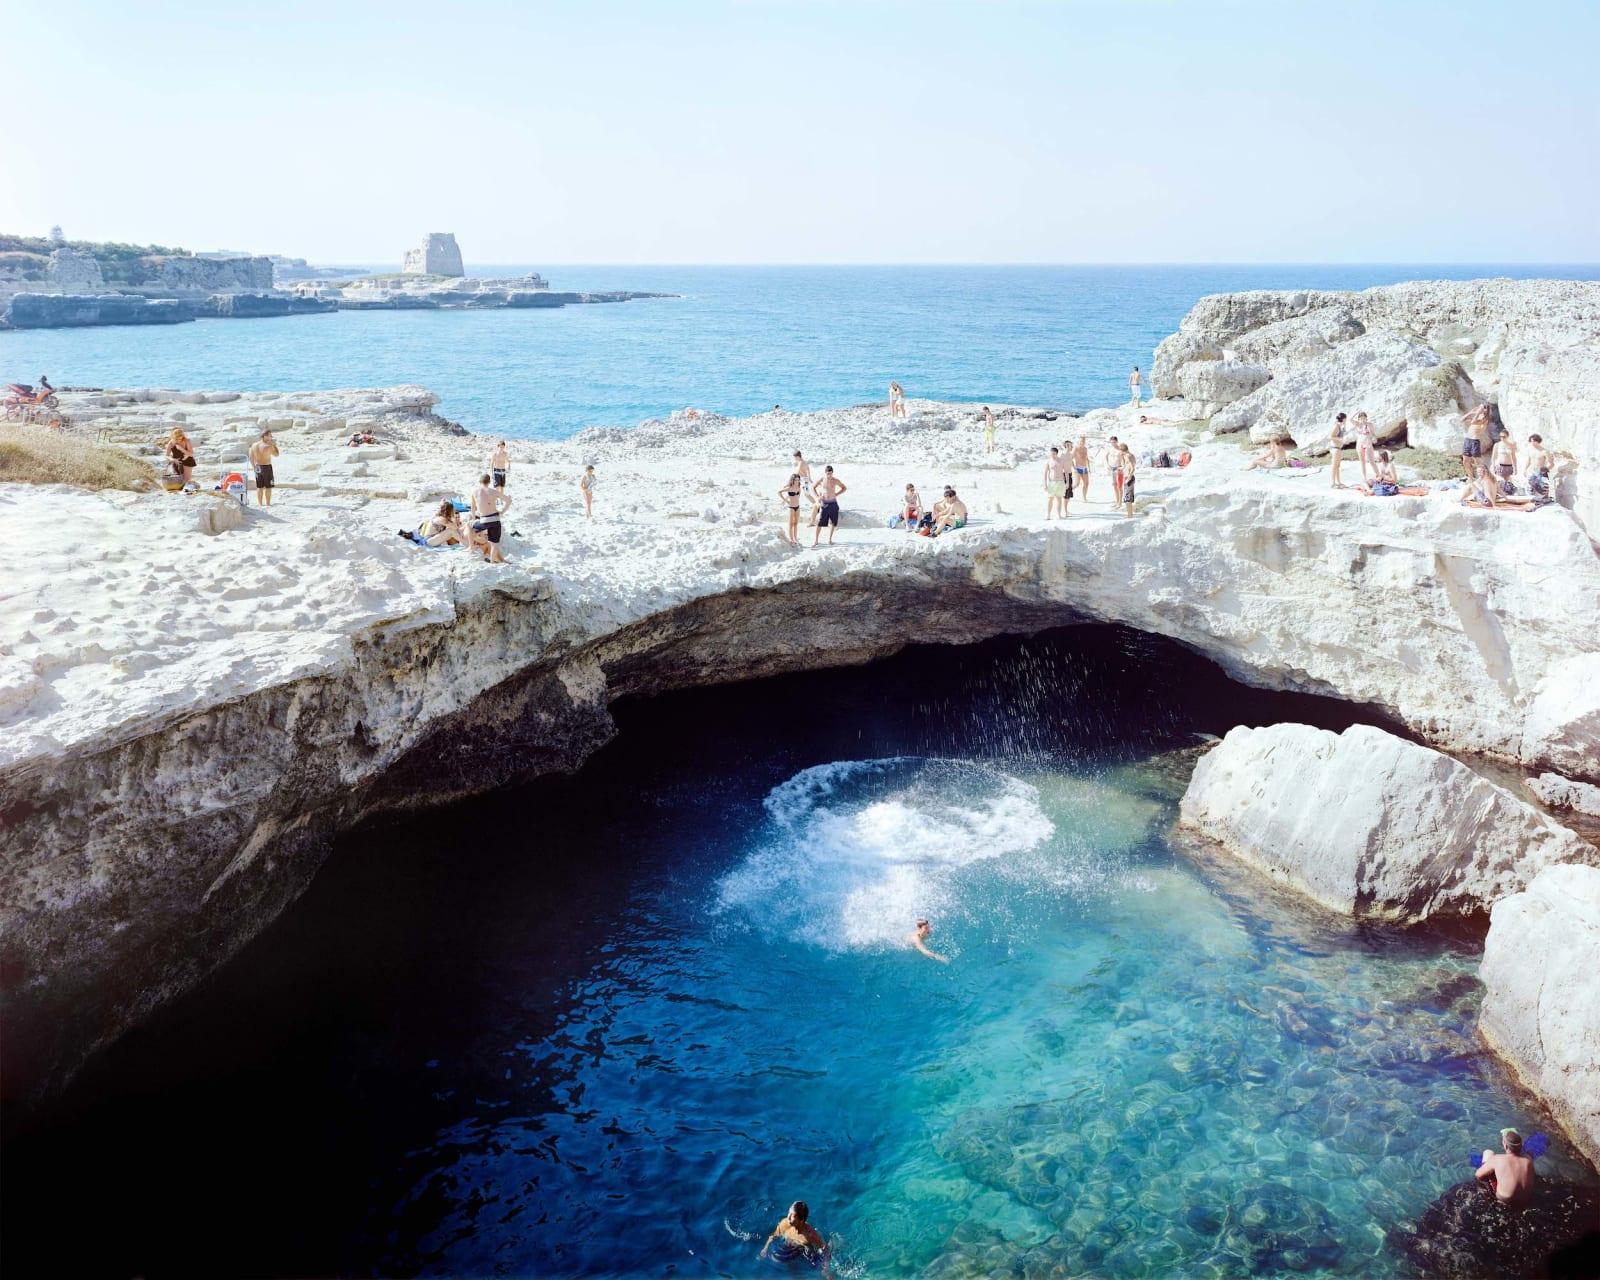 Beachgoers sunbathing at grotto Poesia Tuffo, Italy by Massimo Vitali